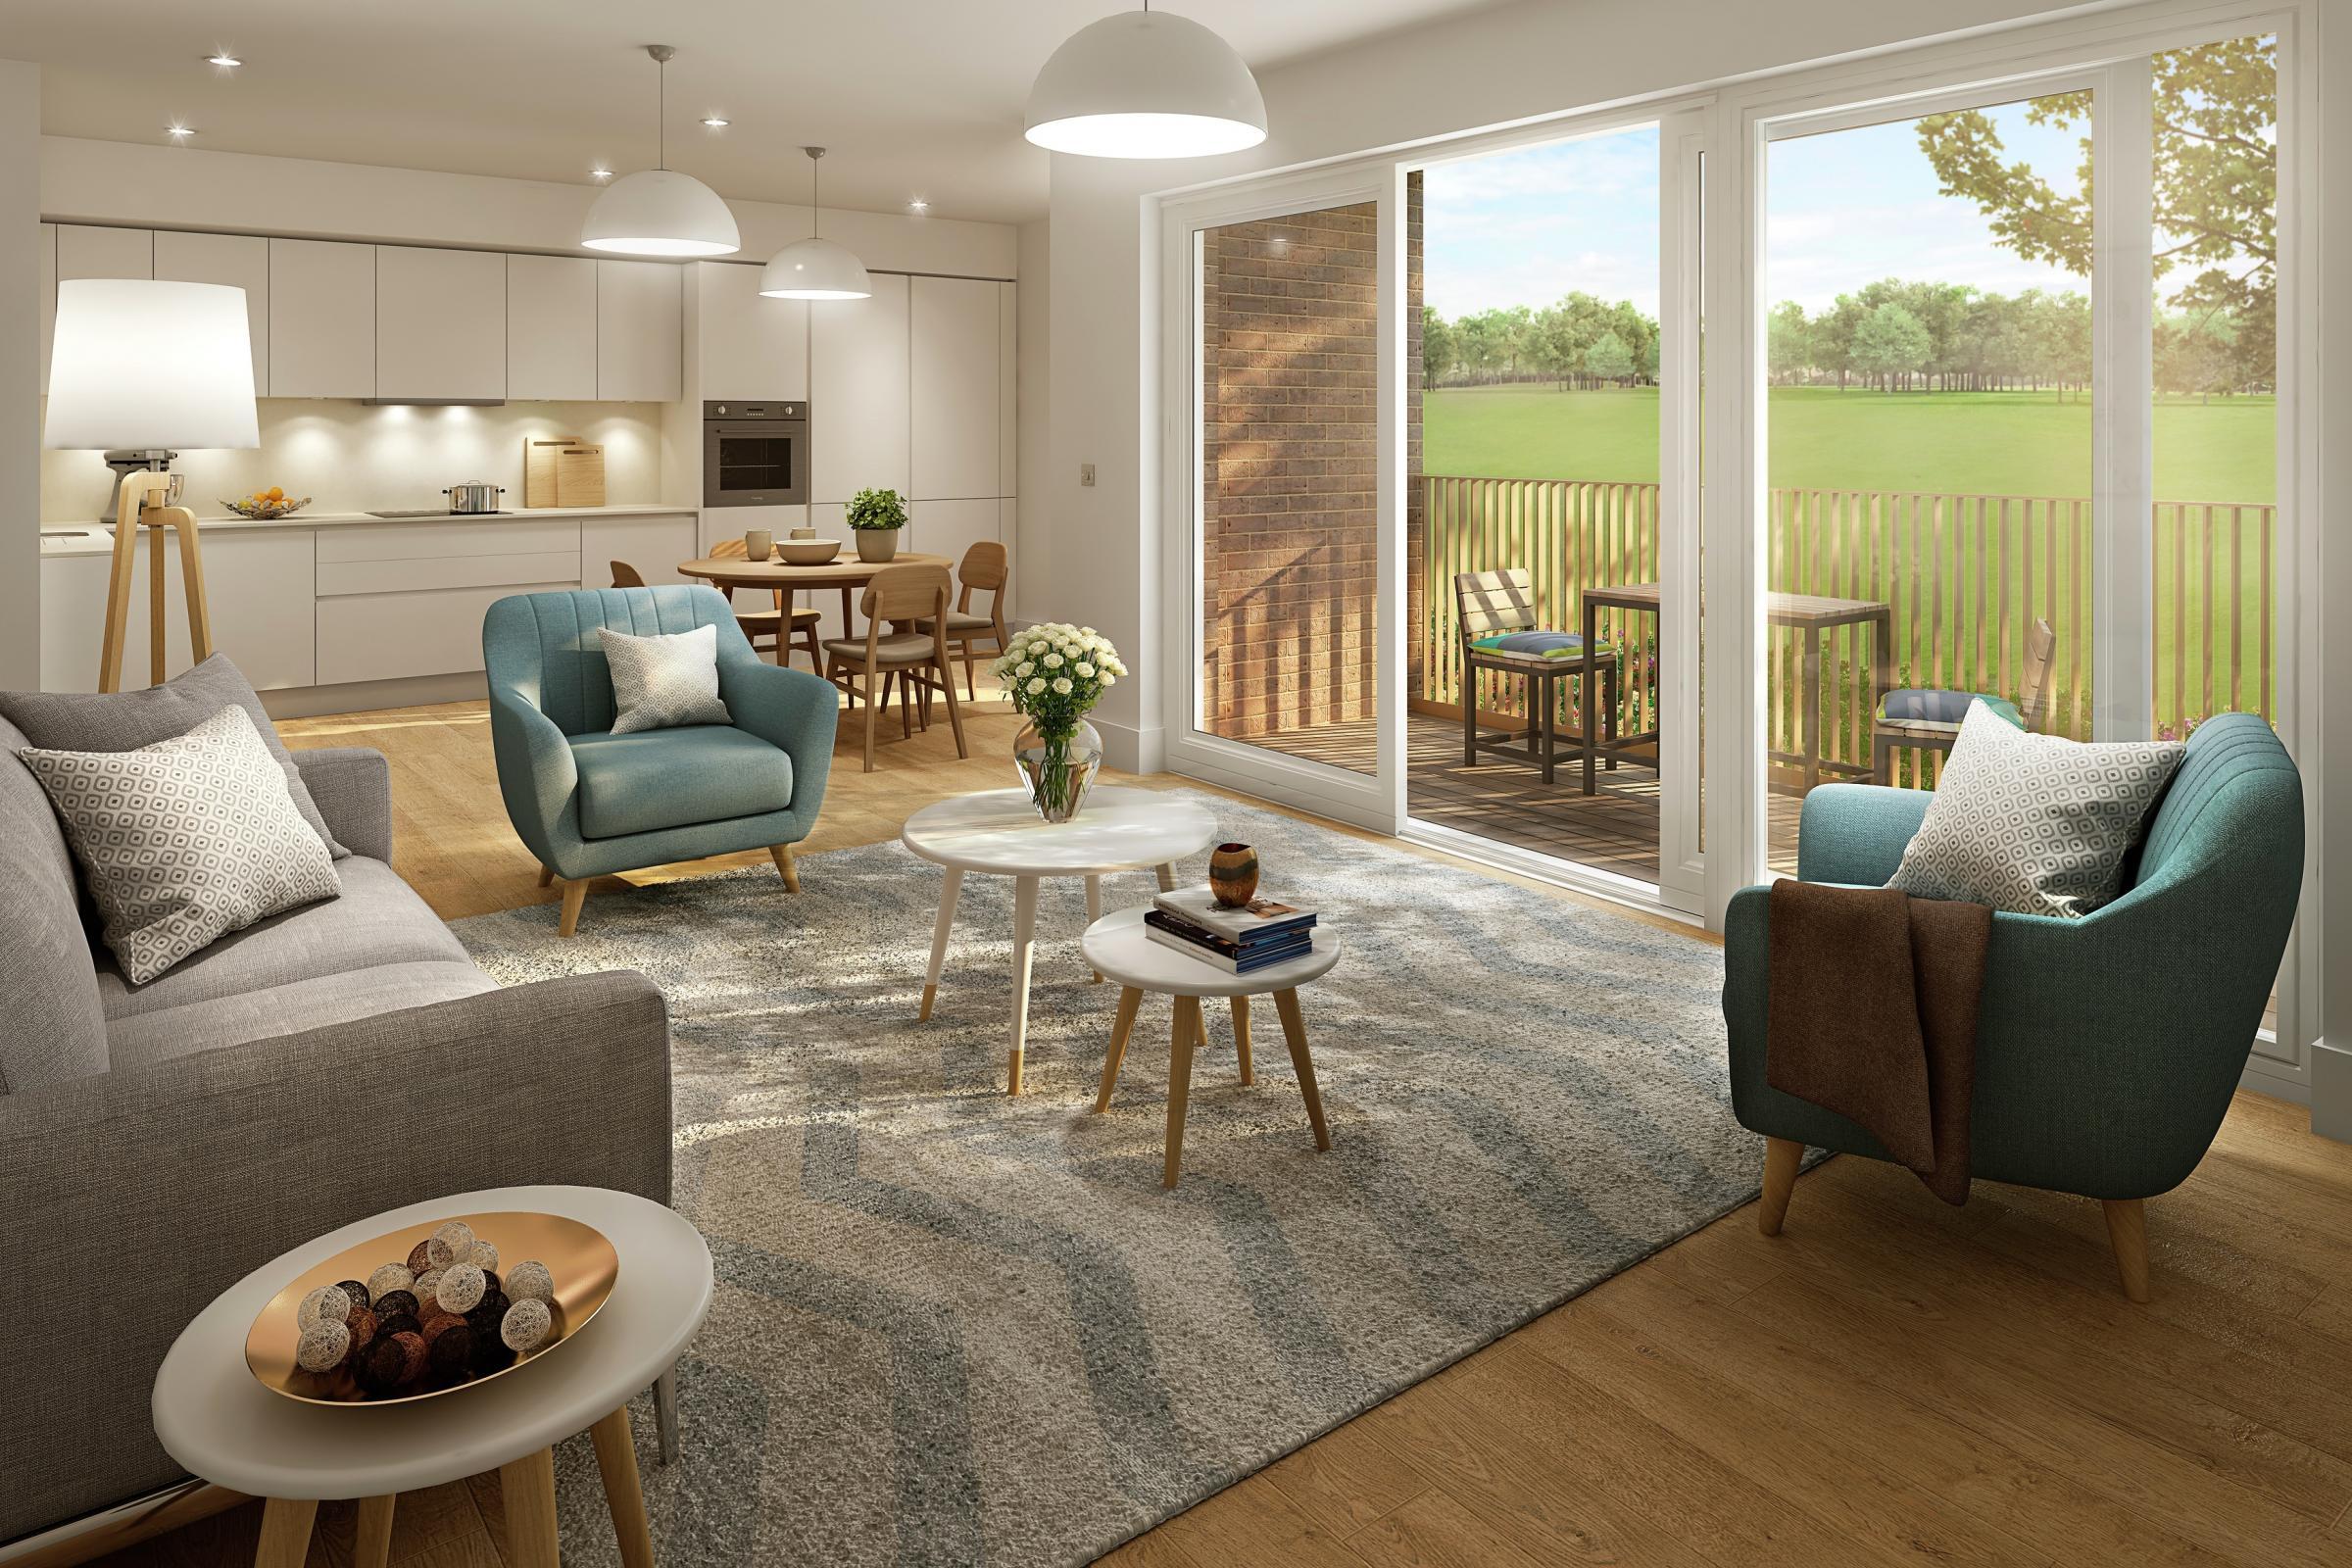 Jordanhill Park apartments on historic university campus site hit market